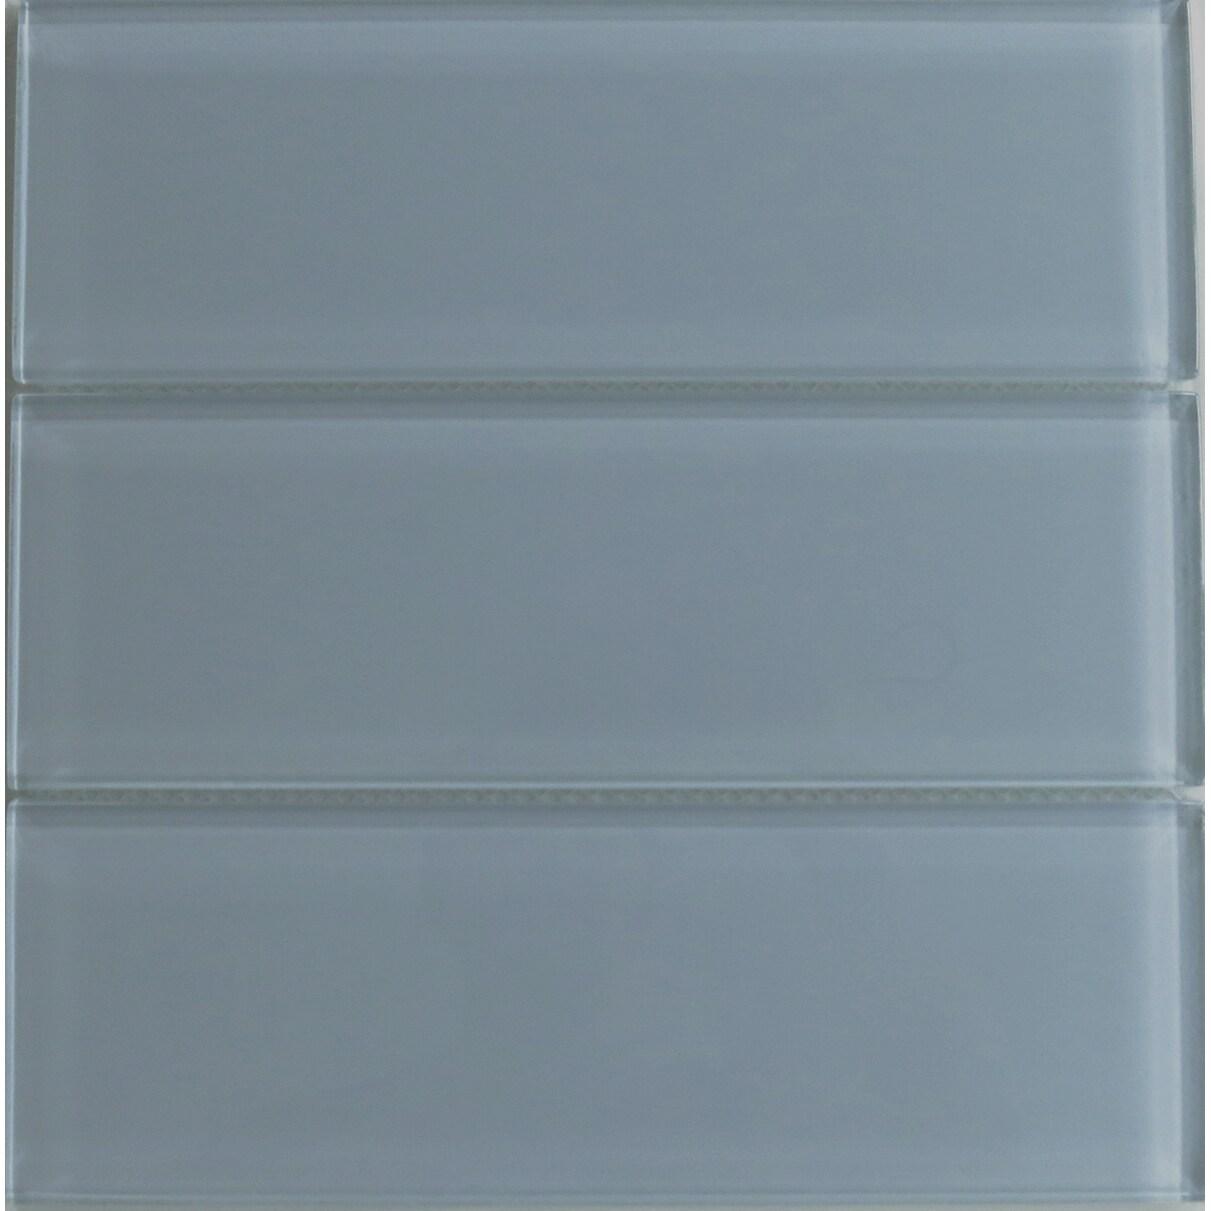 Subway tiles modwalls fog bank gray 4x12 lush glass subway tile dailygadgetfo Images